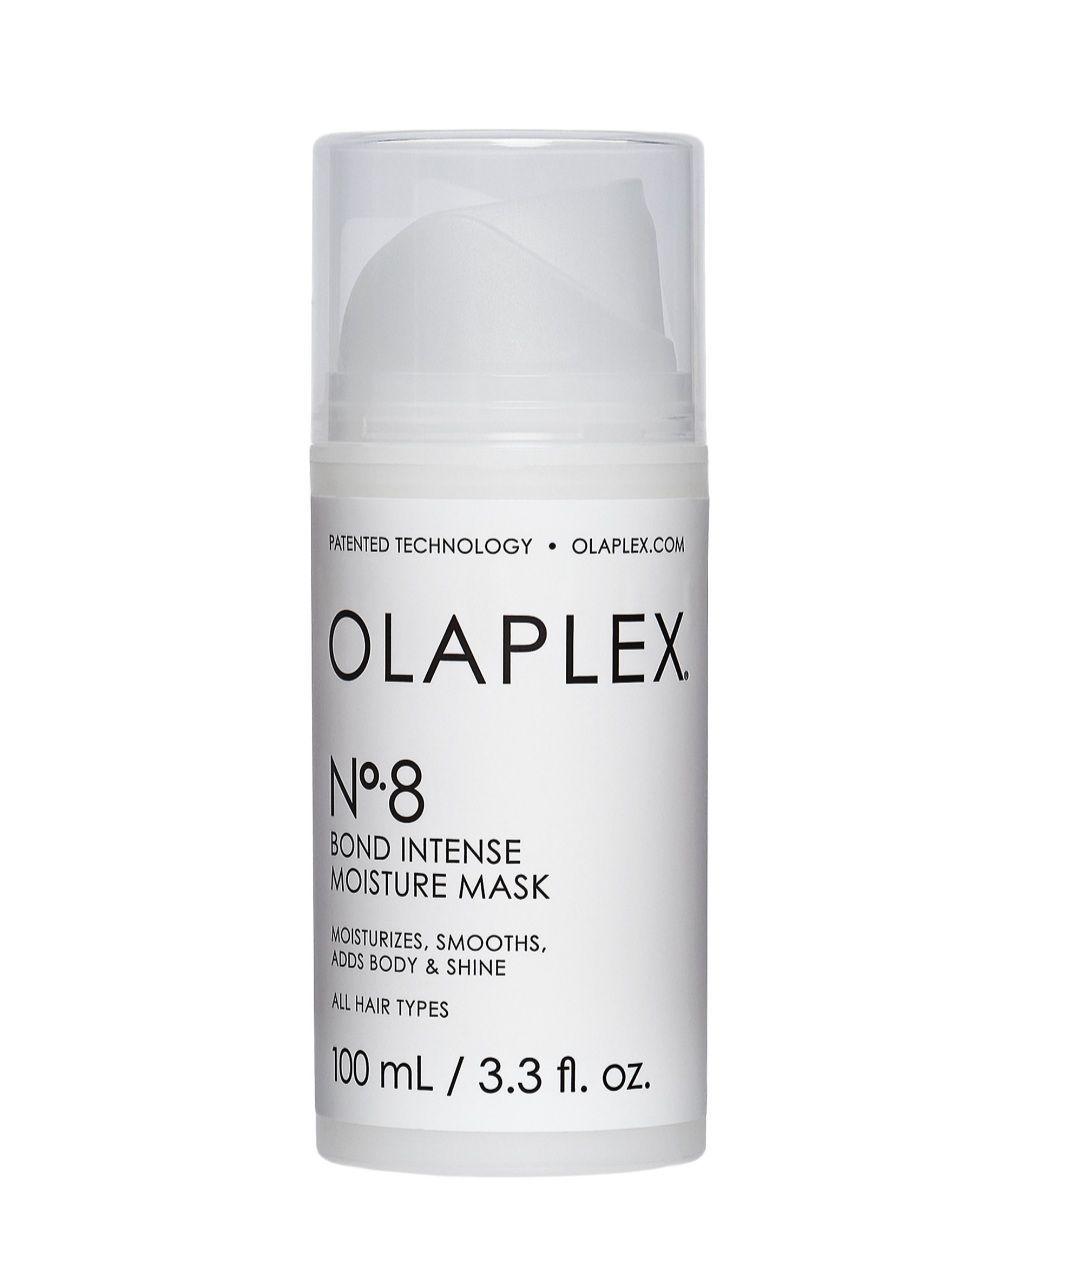 Olaplex N°8 Bond Intense Moisture Mask